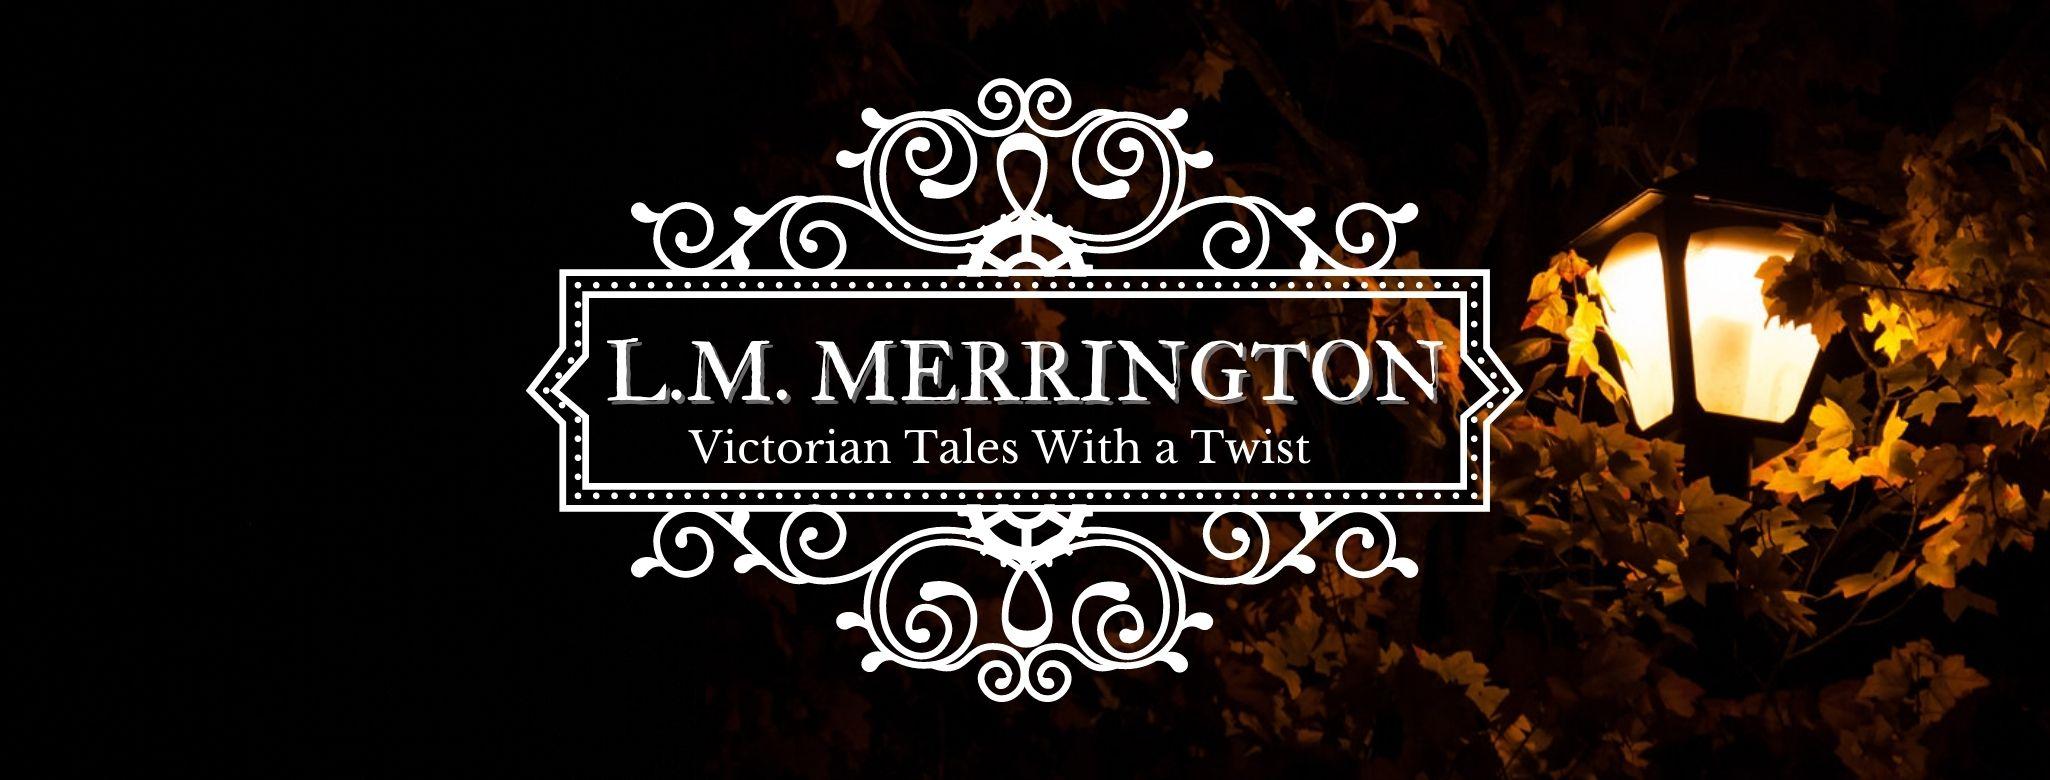 L.M. Merrington